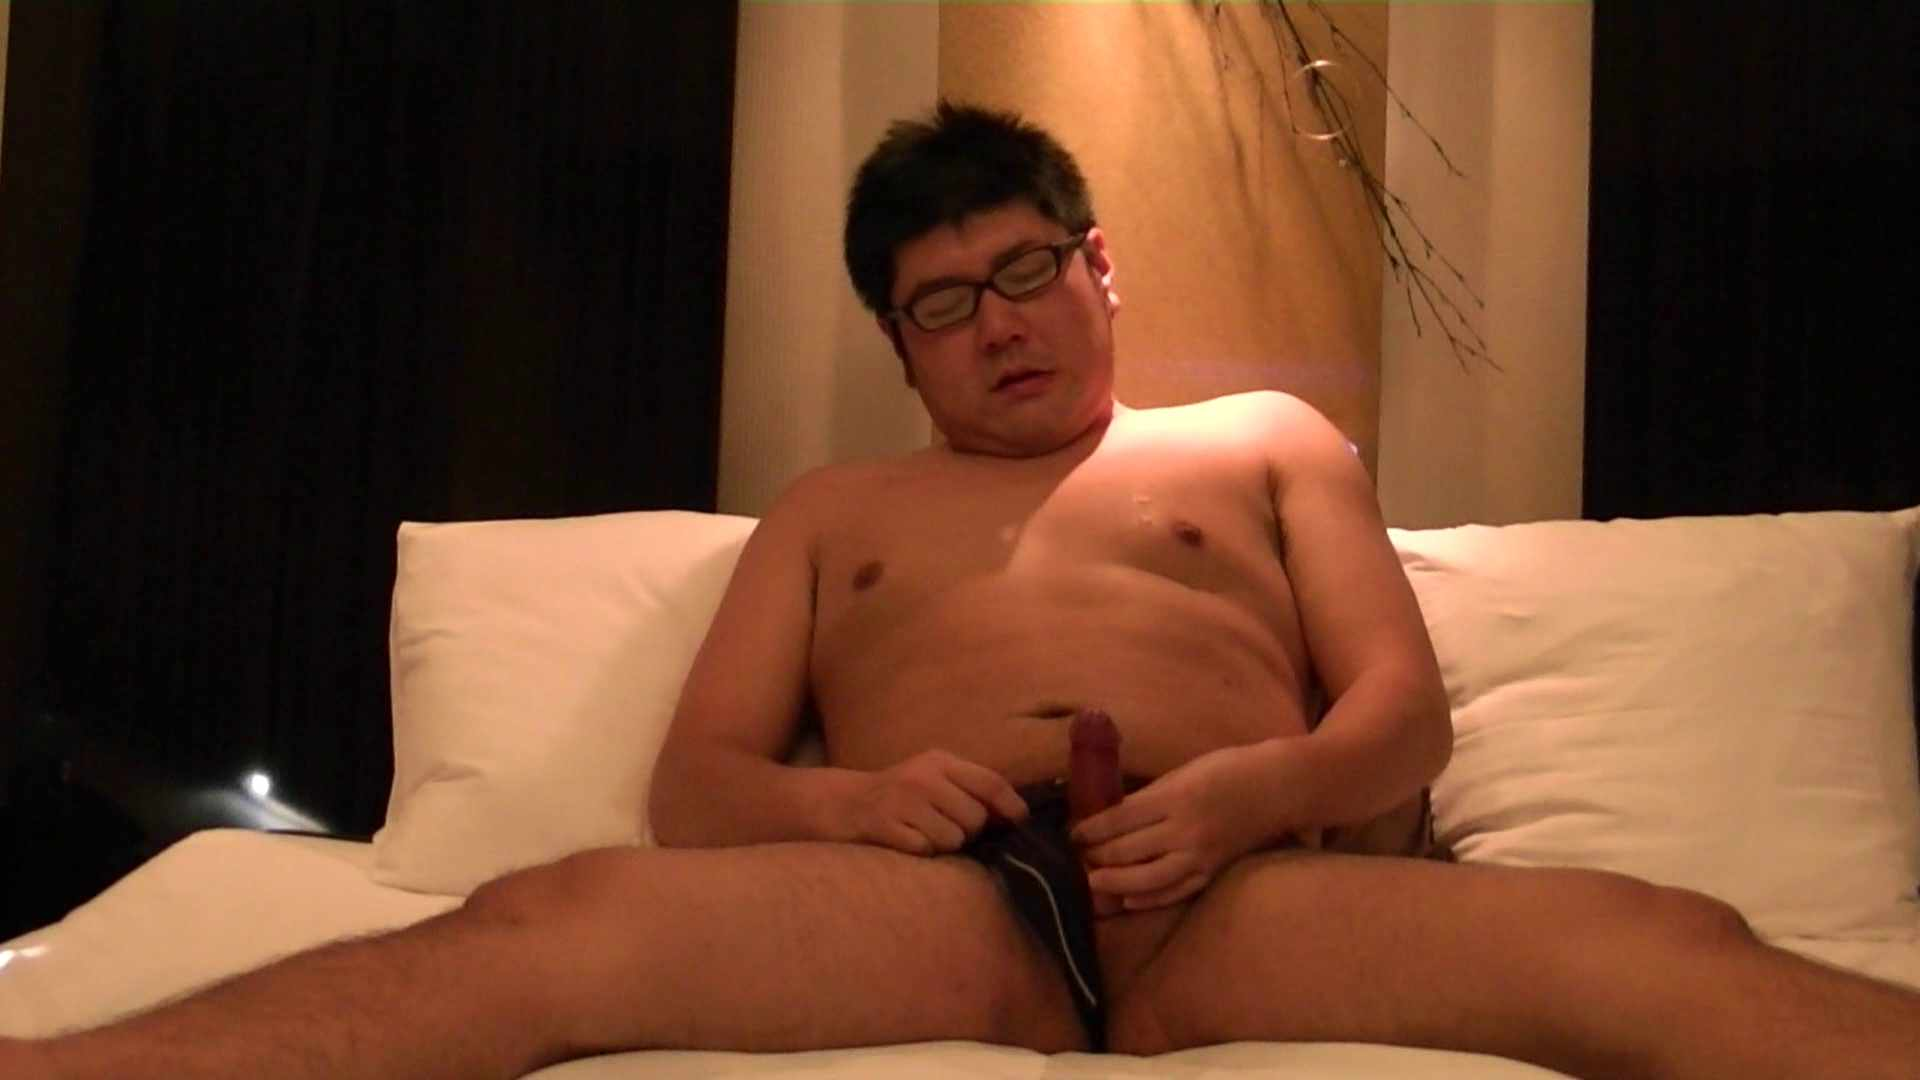 Mr.オナックスさん投稿!HD 貴方のオナニー三万円で撮影させてください。VOL.02 前編 0 | オナニー特集  72pic 38